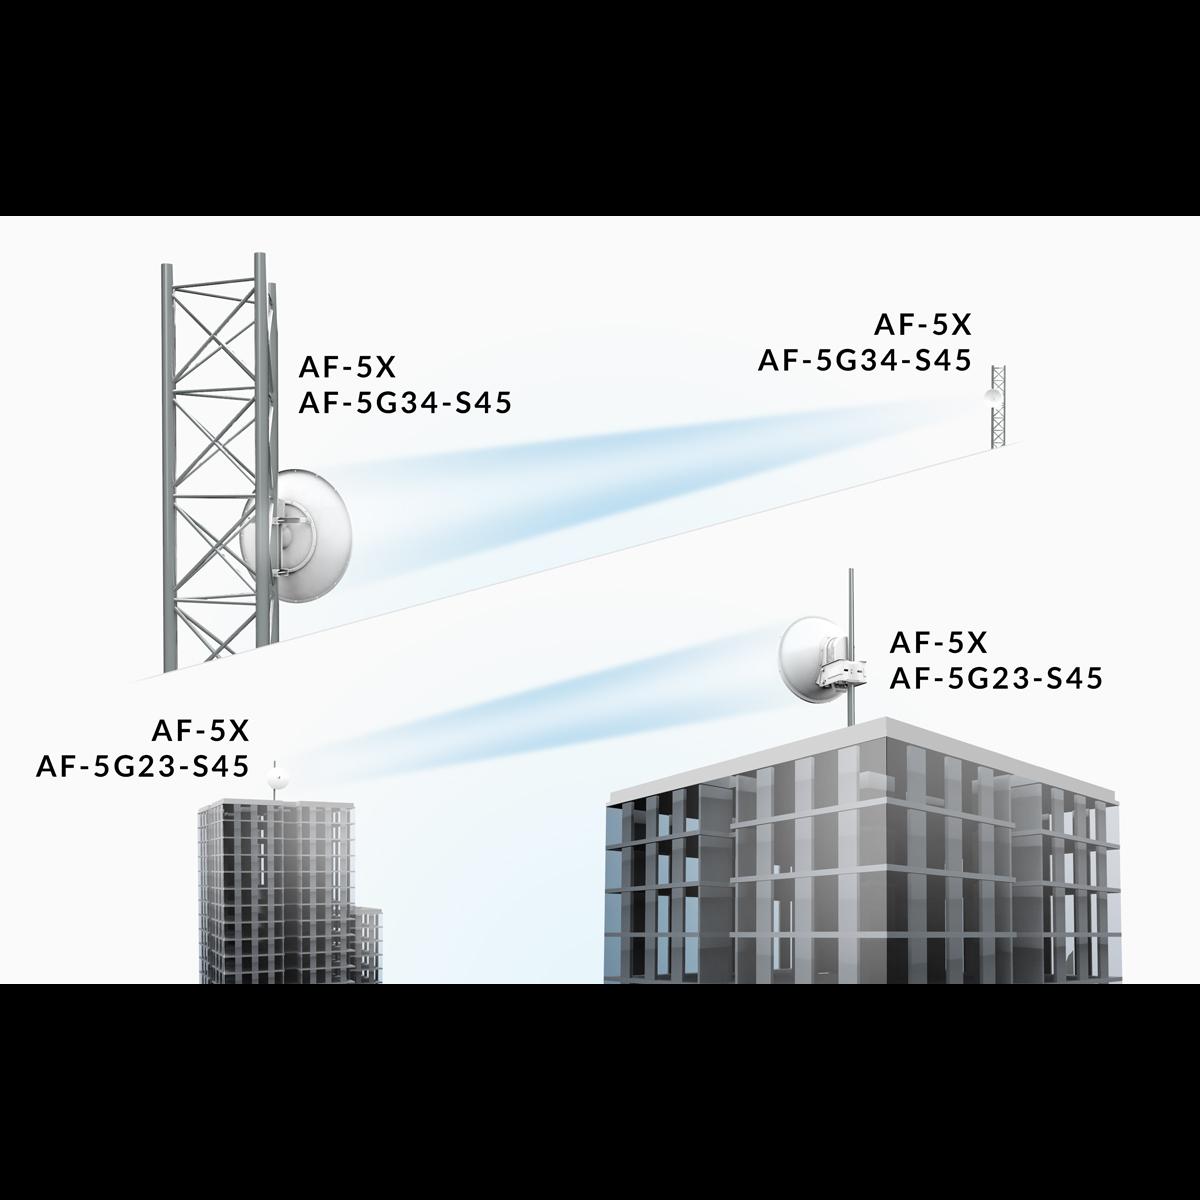 Антенна Ubiquiti airFiber AF-5G34-S45